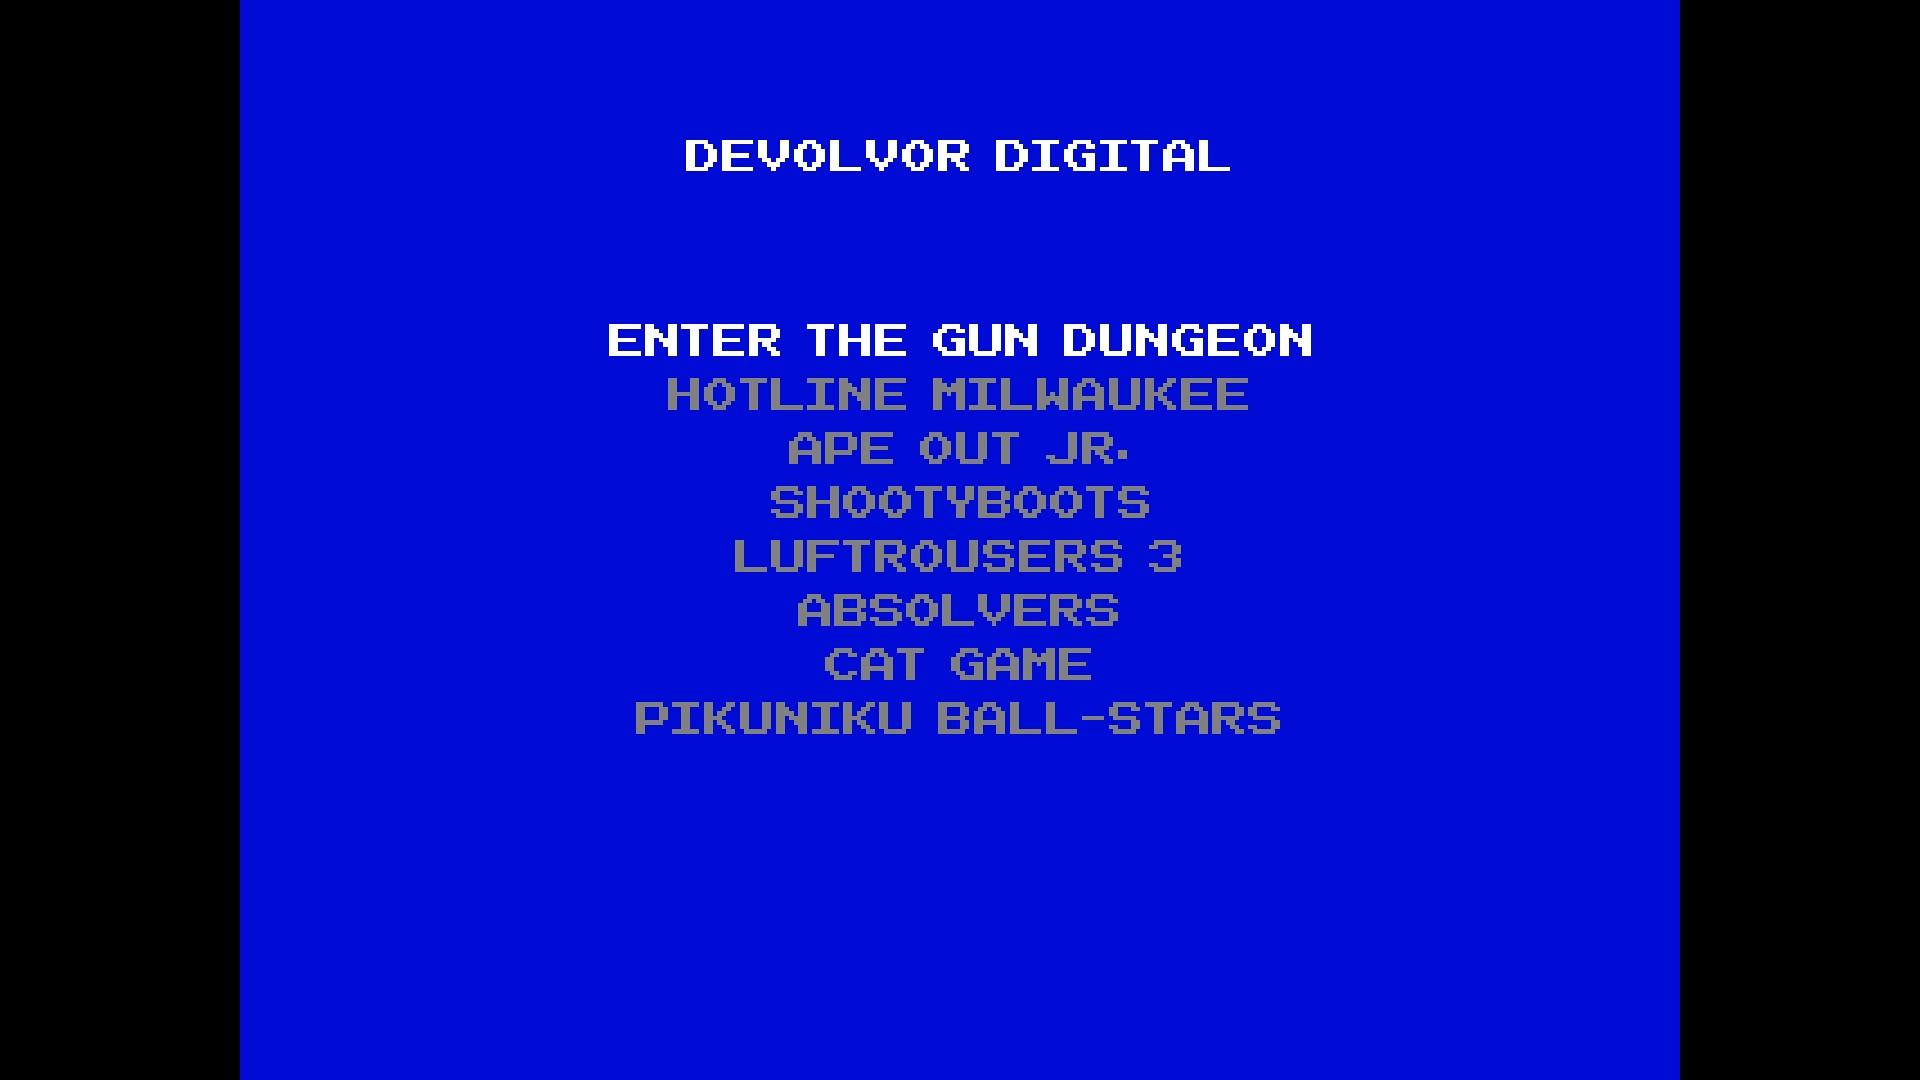 Find the best laptops for Devolver Bootleg